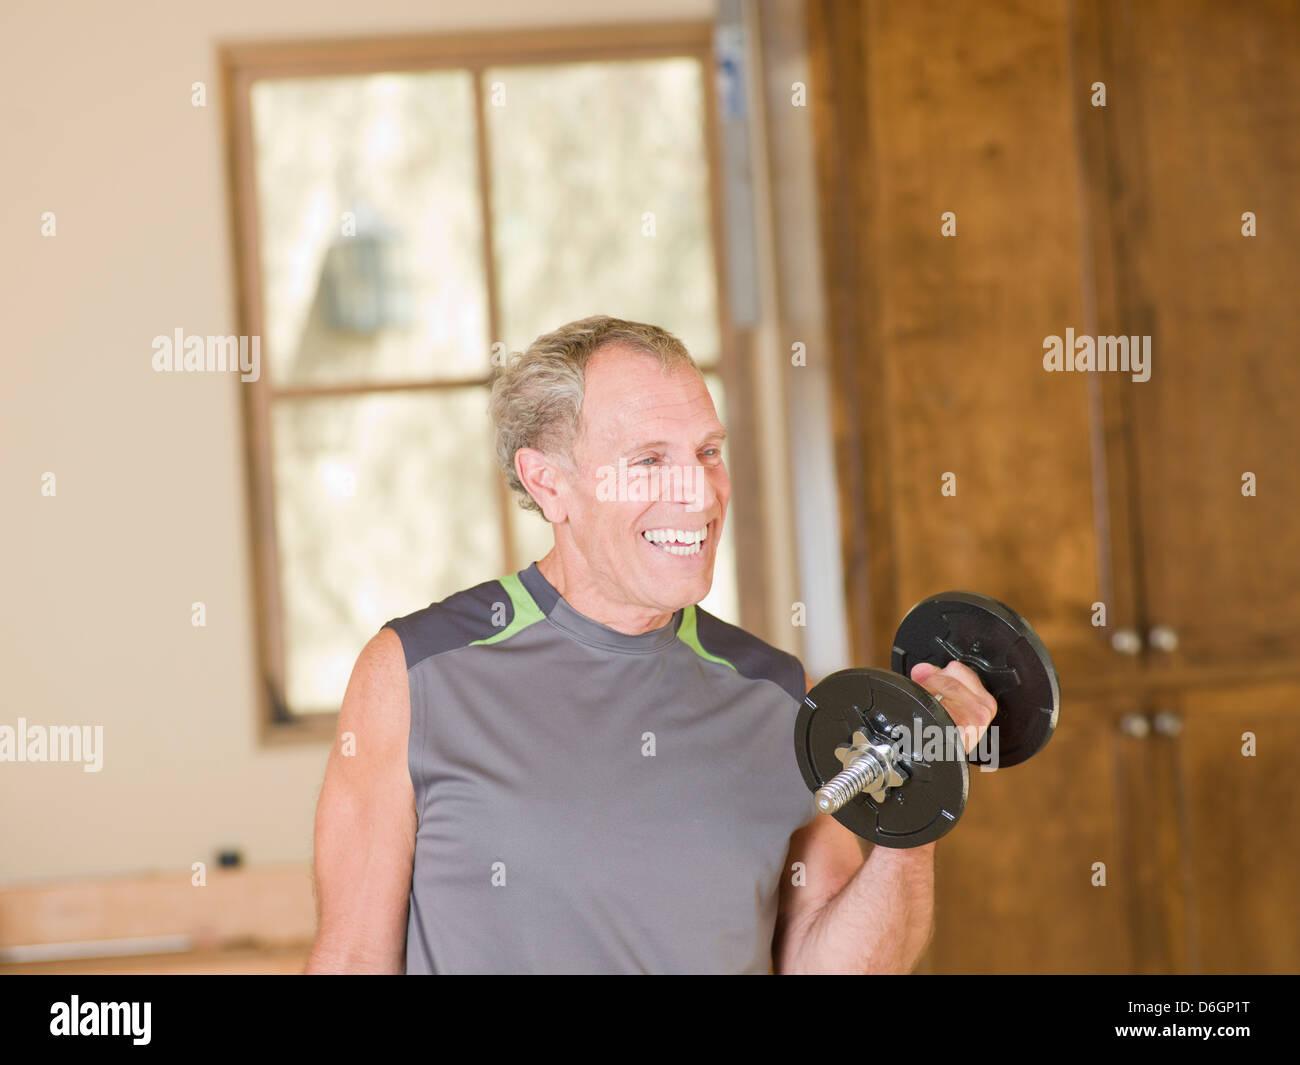 Older man lifting weights at home - Stock Image